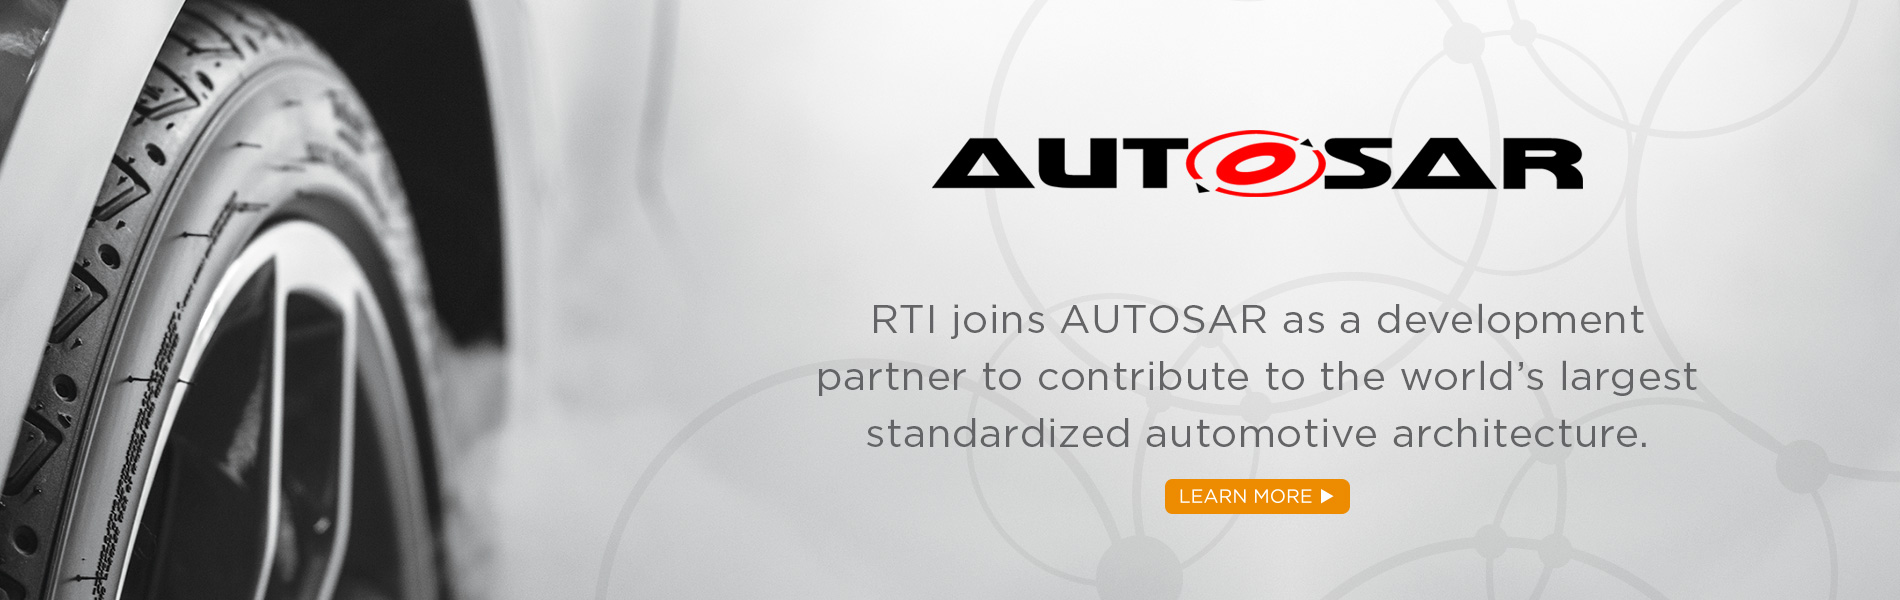 RTI joins AUTOSAR as a development partner